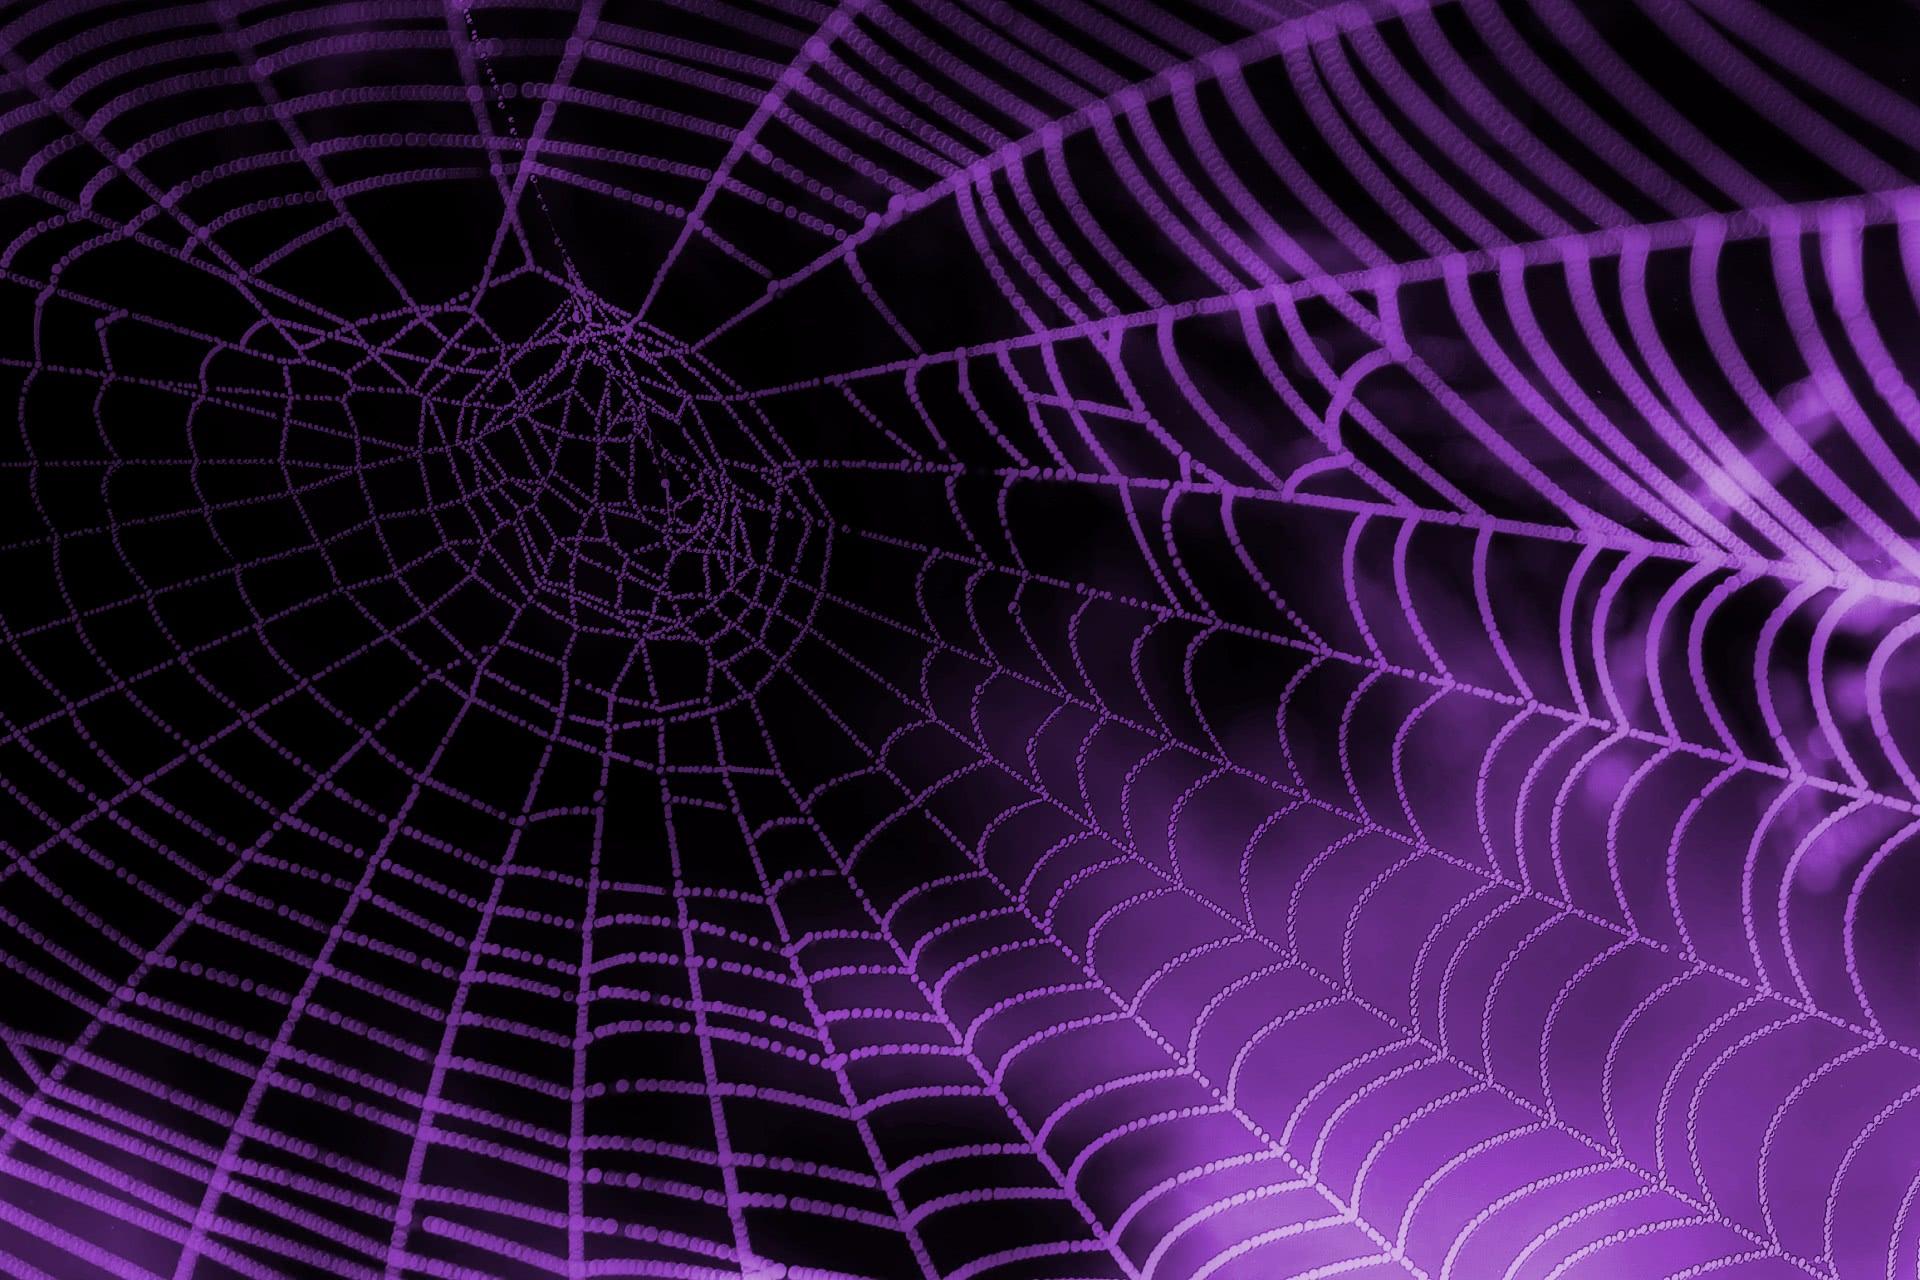 spider web purple   scenic  wallpaper  animals  spider web purple jpg html clip art spider web background clip art spider webs pictures